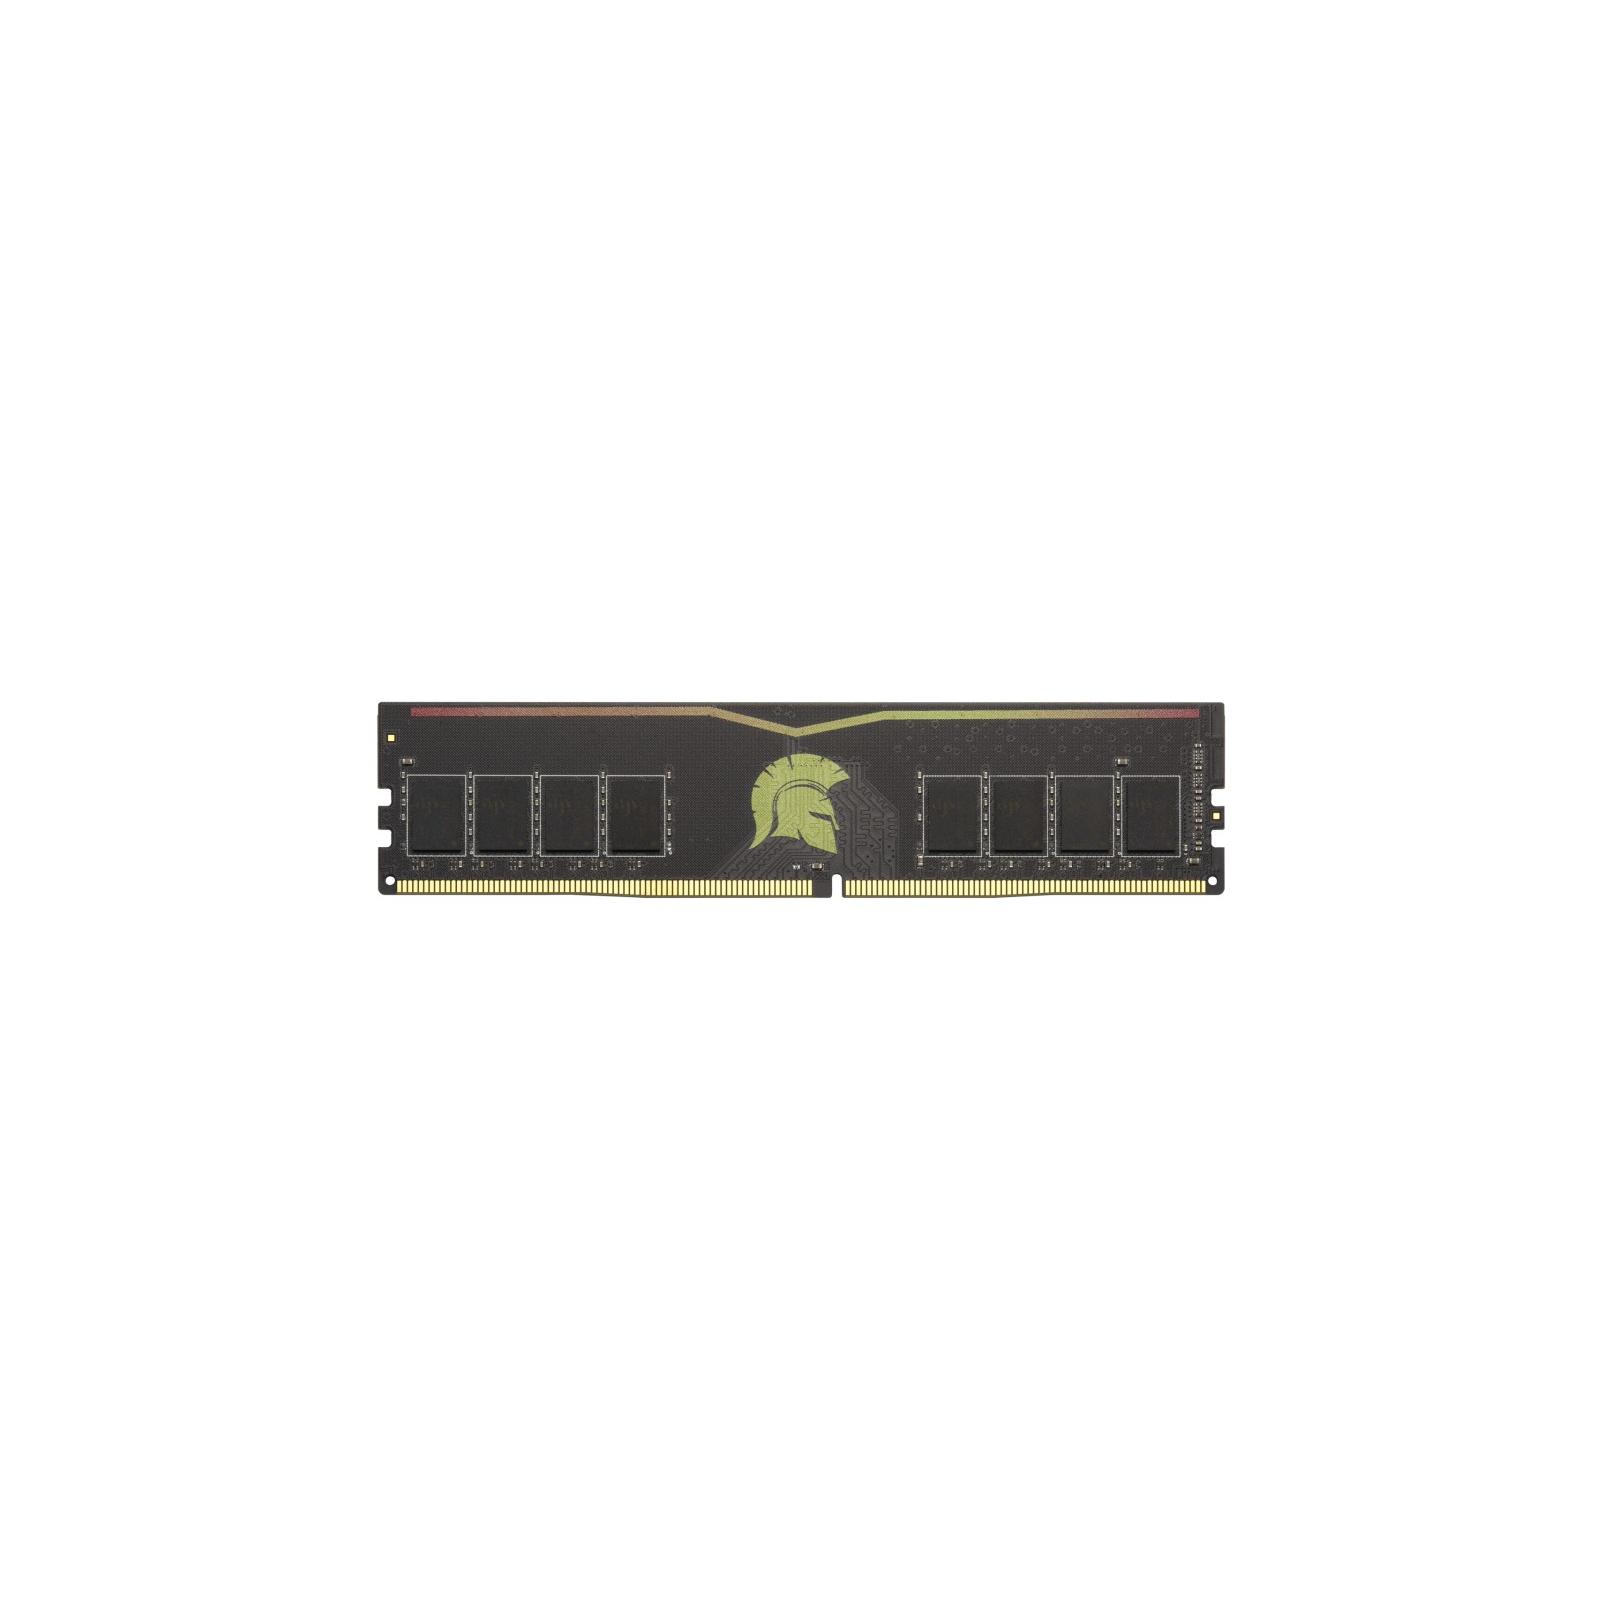 Модуль памяти для компьютера DDR4 8GB 3000 MHz Yellow eXceleram (E47064A)